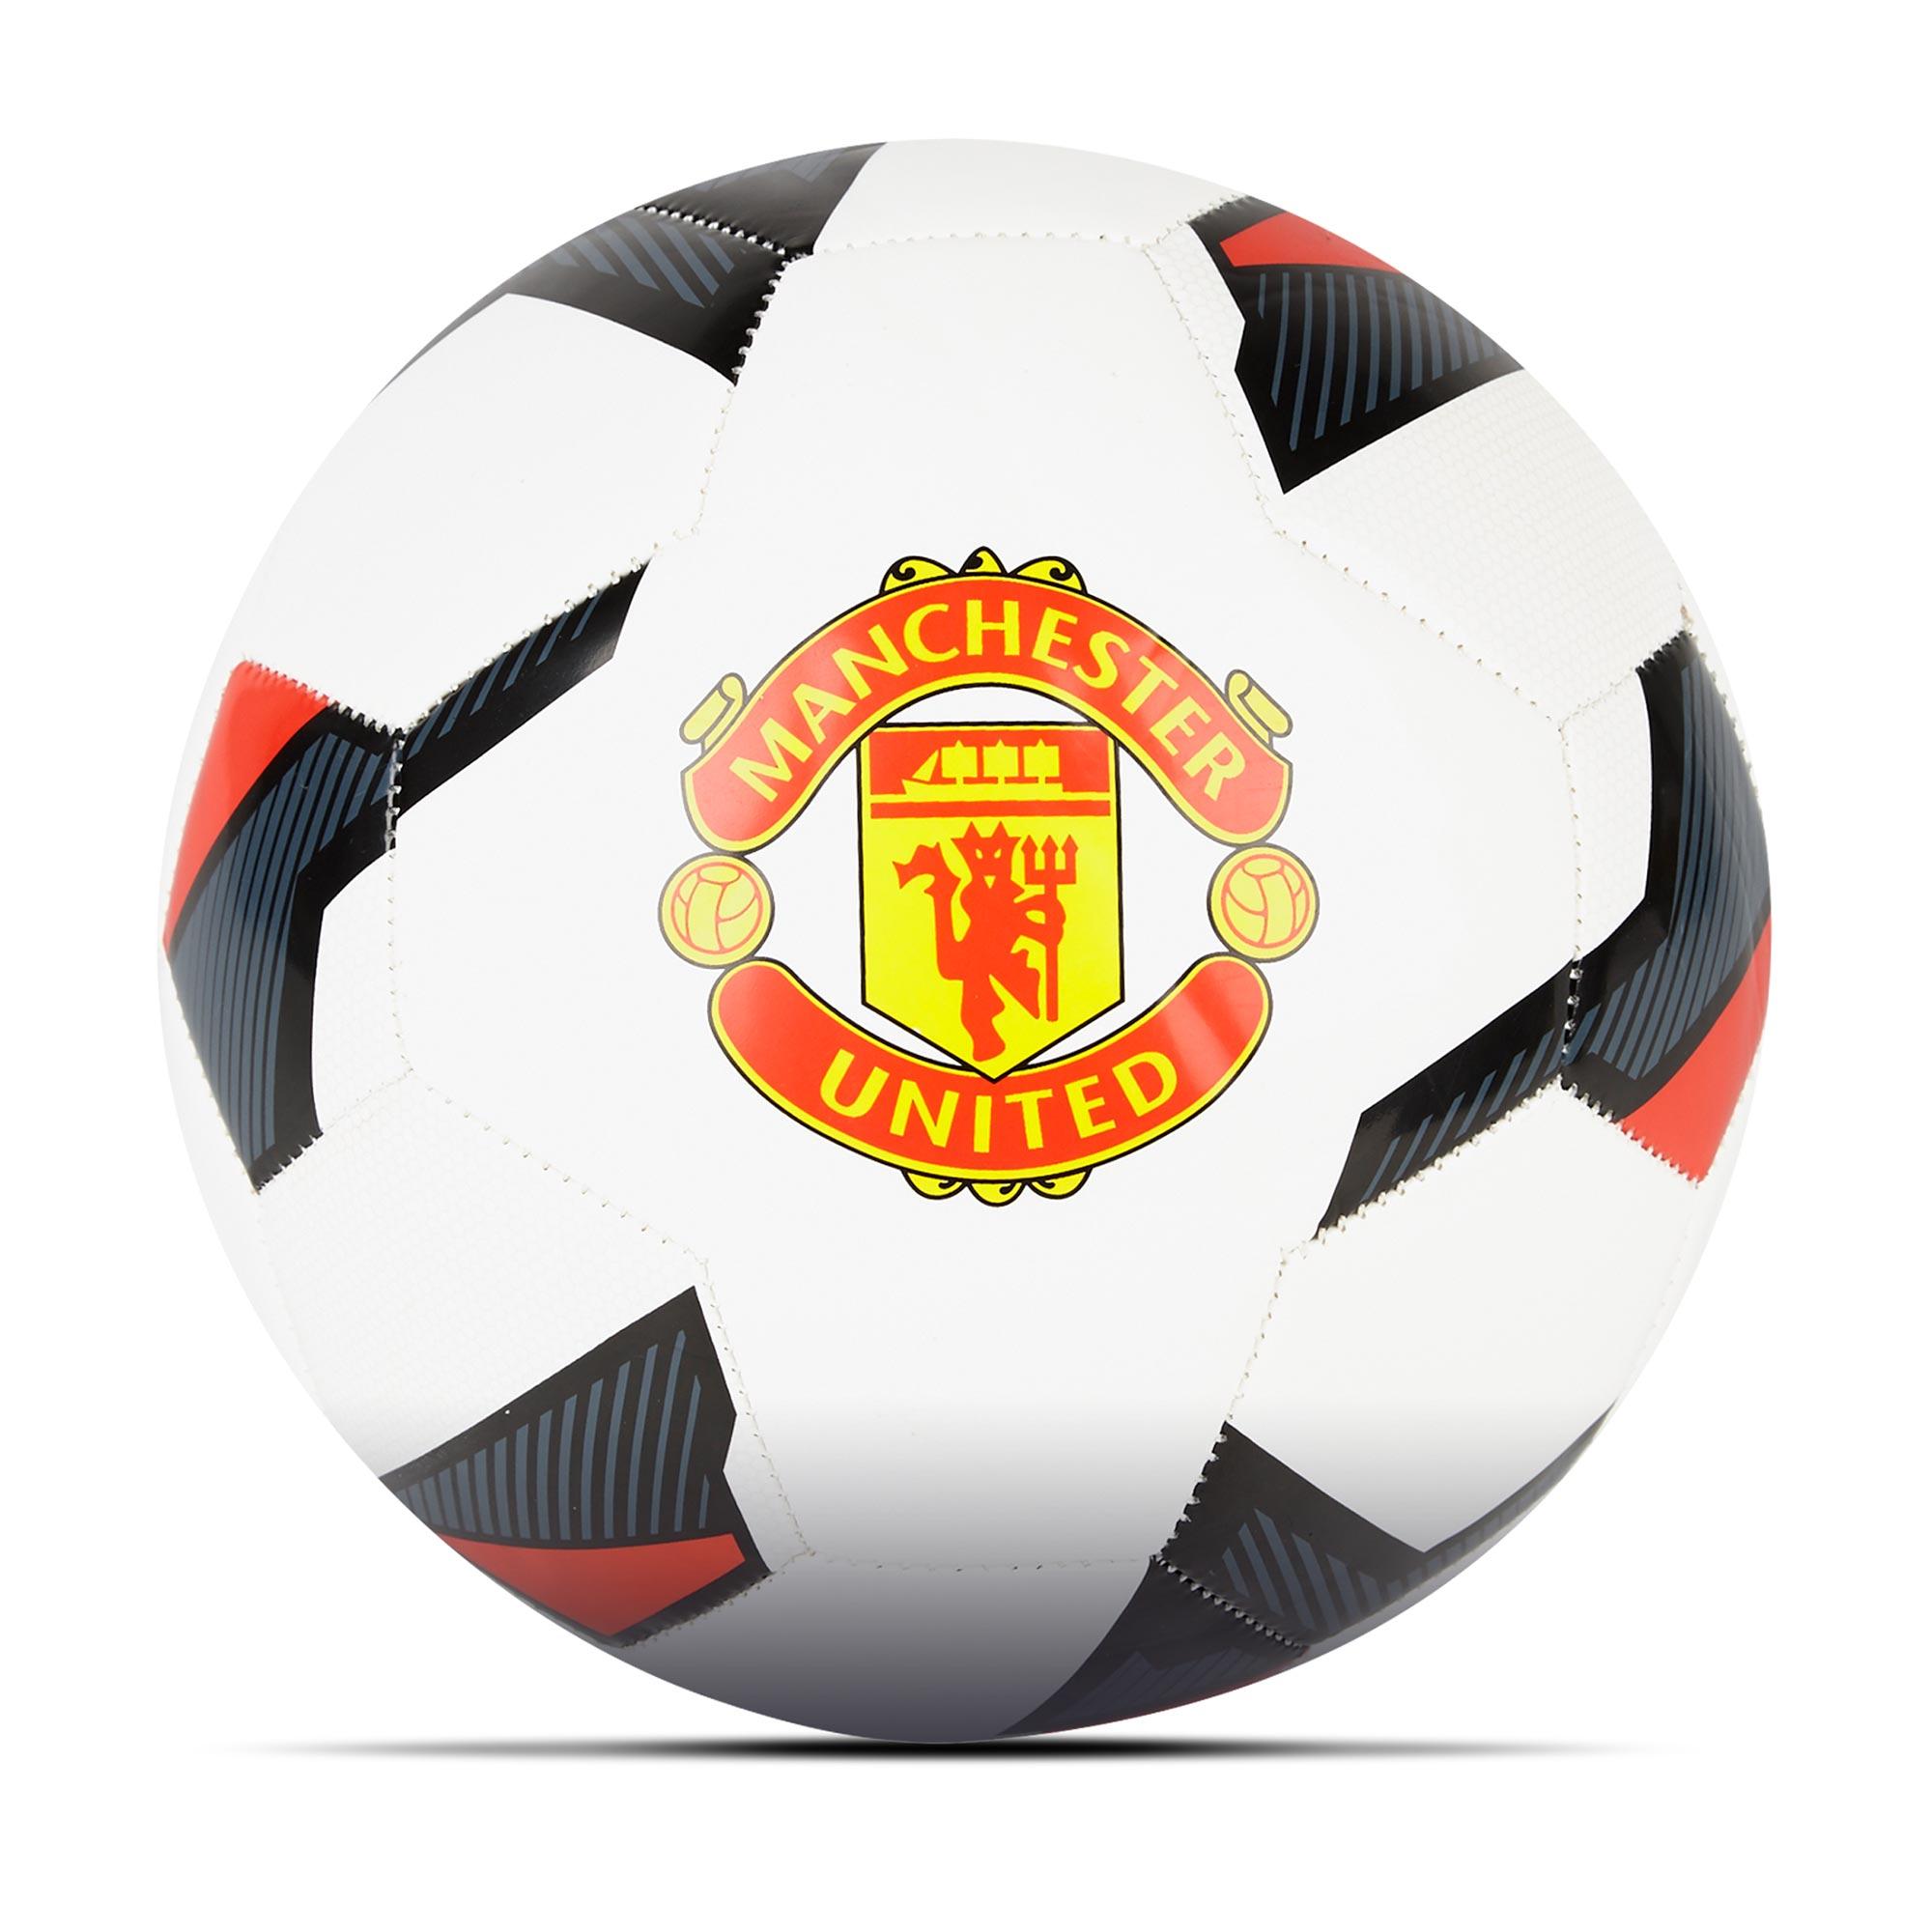 Ballon de football avec grand écusson Manchester United - Blanc/Noir -